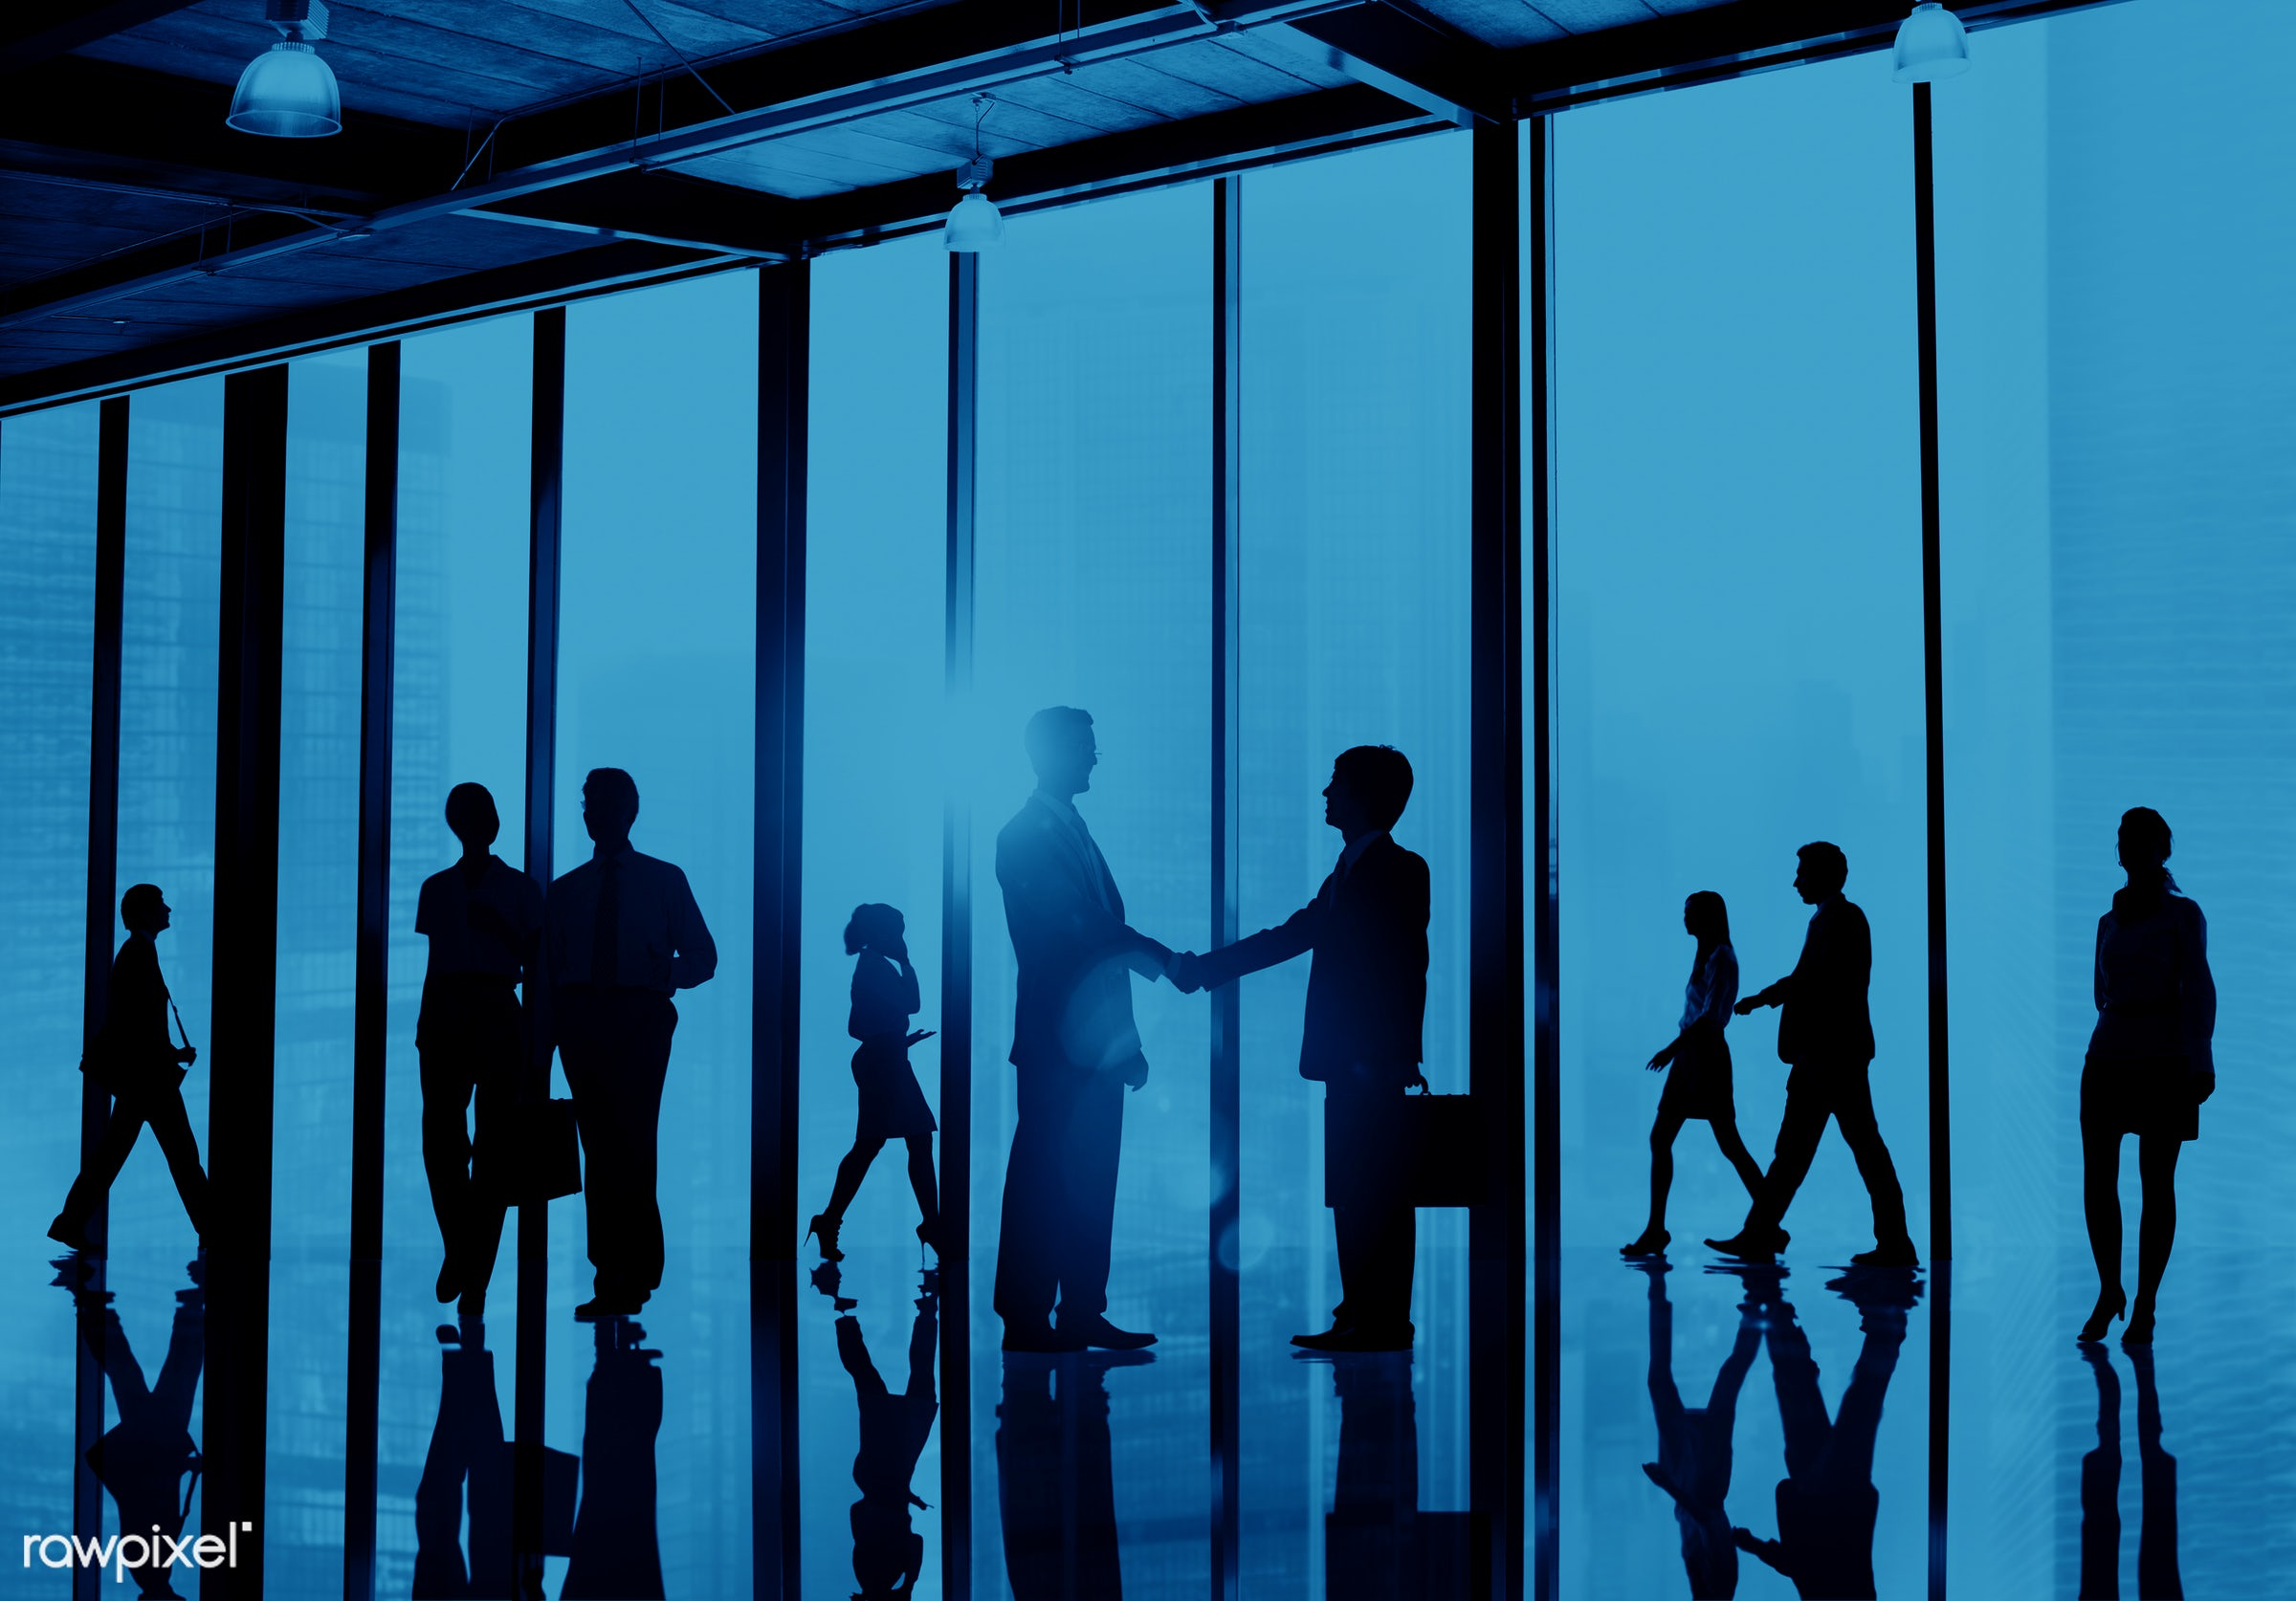 agreement, back lit, blue, brainstorming, briefcase, building, business, business people, businessmen, businesswomen, city,...